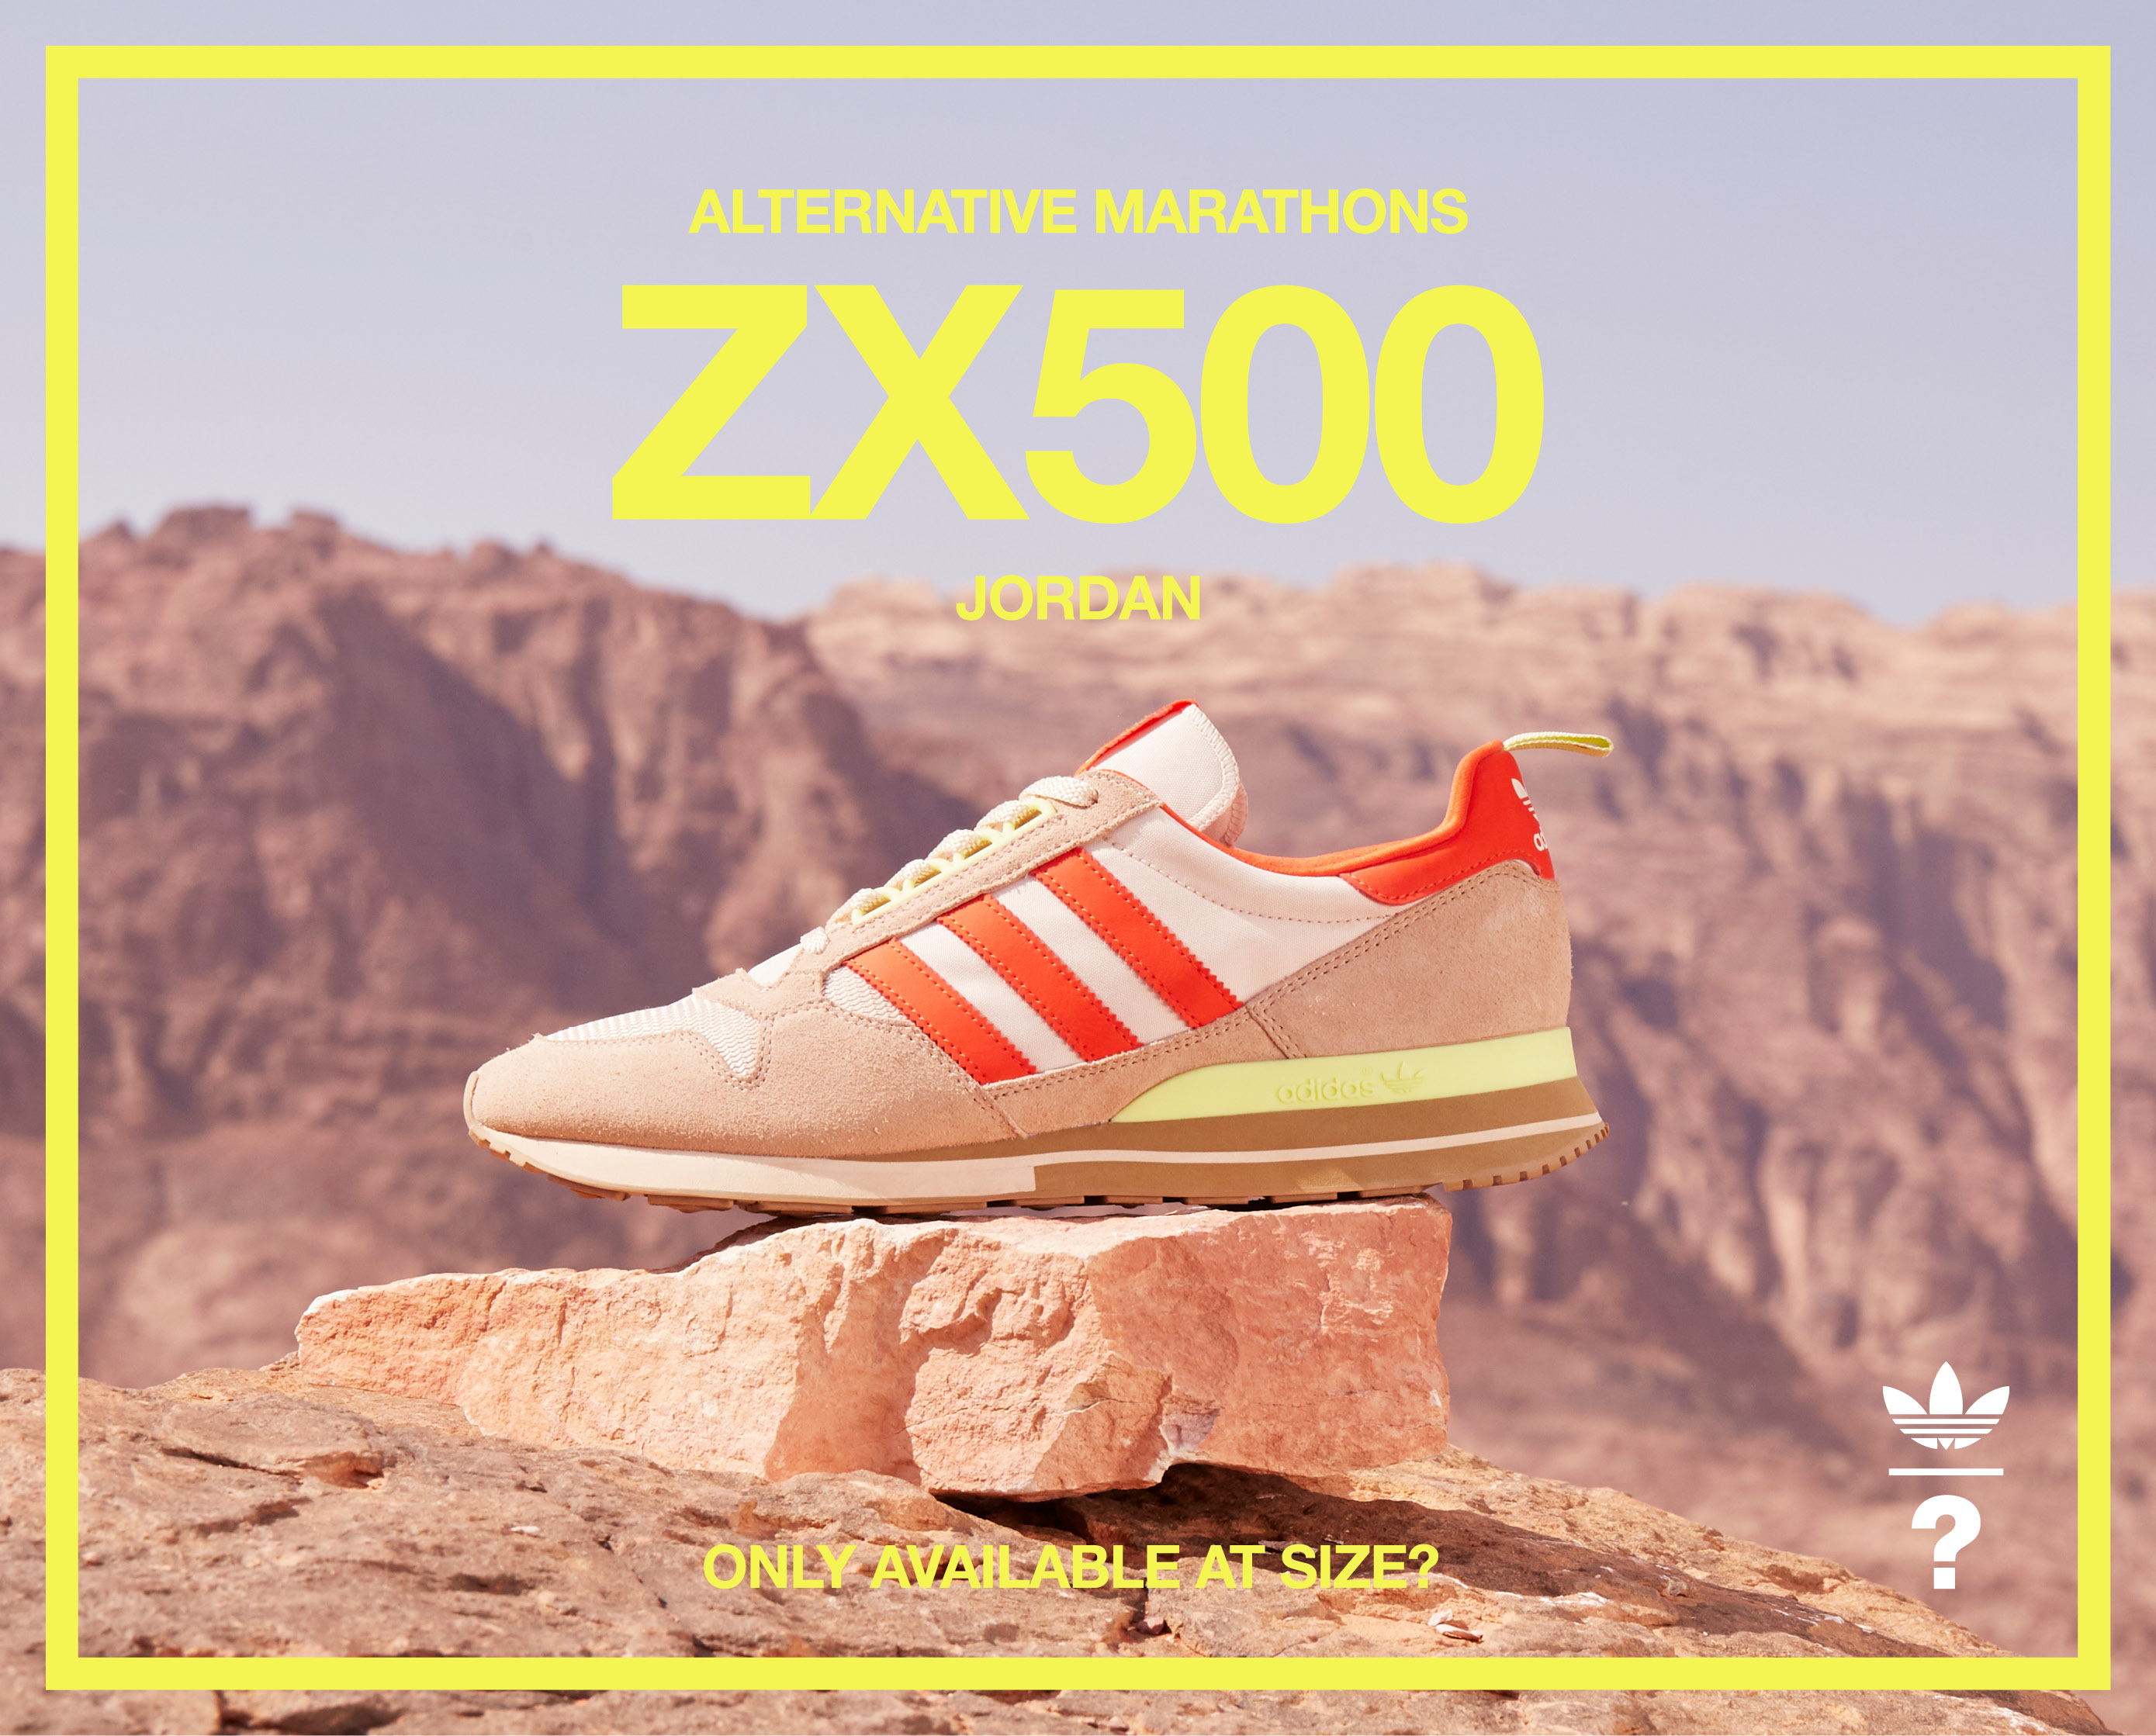 adidas Originals ZX 500 'Jordan' – size? Exclusive